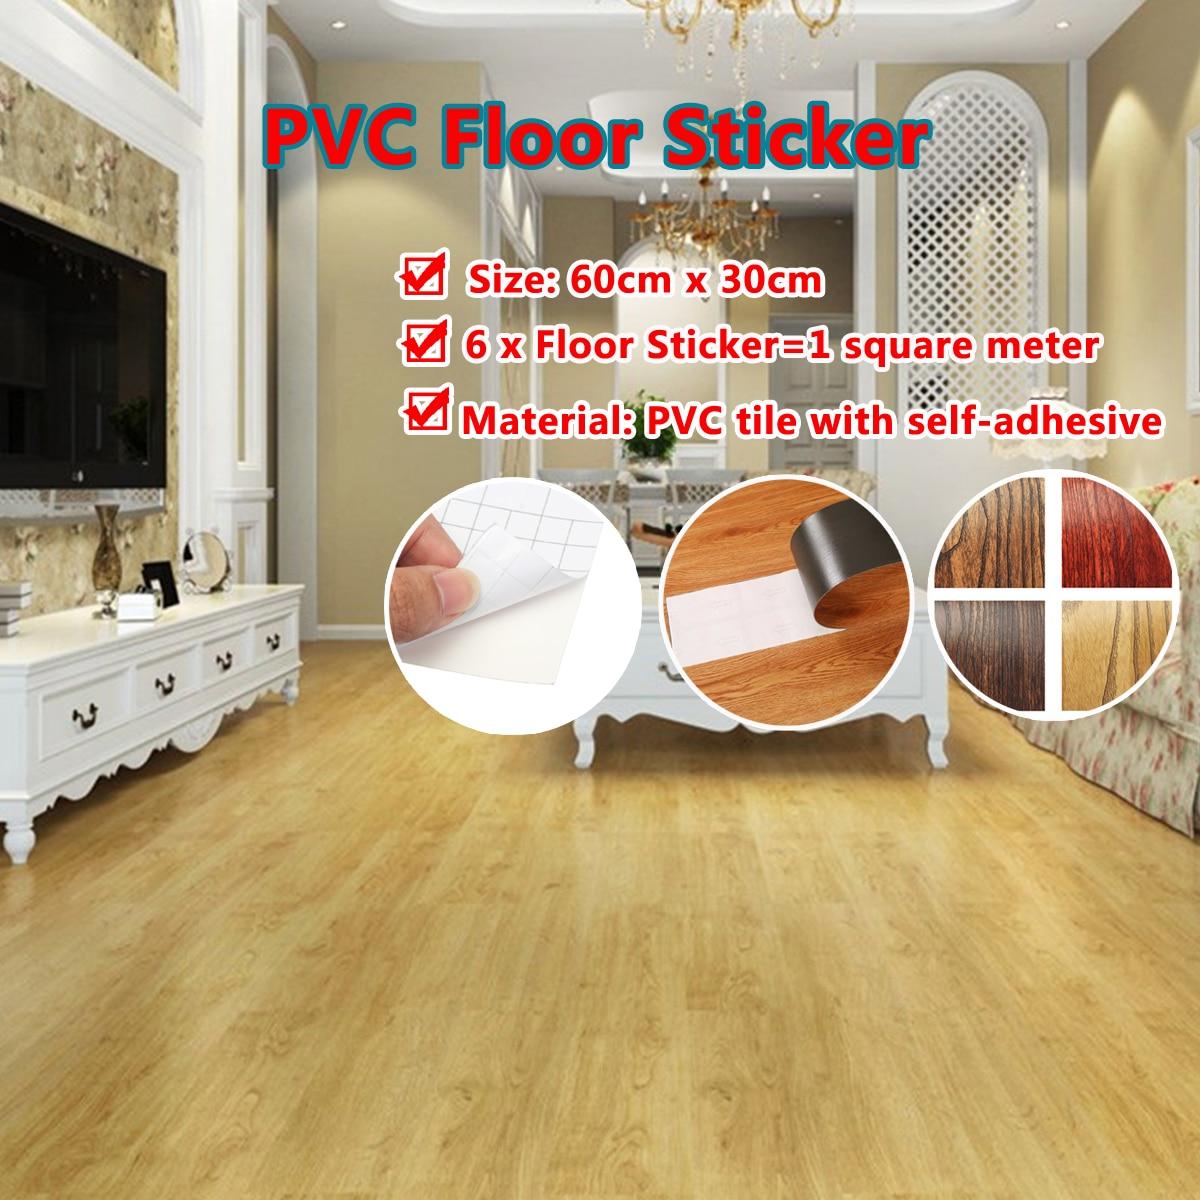 Us 8 51 53 Off Self Adhesive 6 Tile Art Diy Wood Floor Wall Sticker Kitchen Living Room Decor Home Decoration Stickers In Wall Stickers From Home